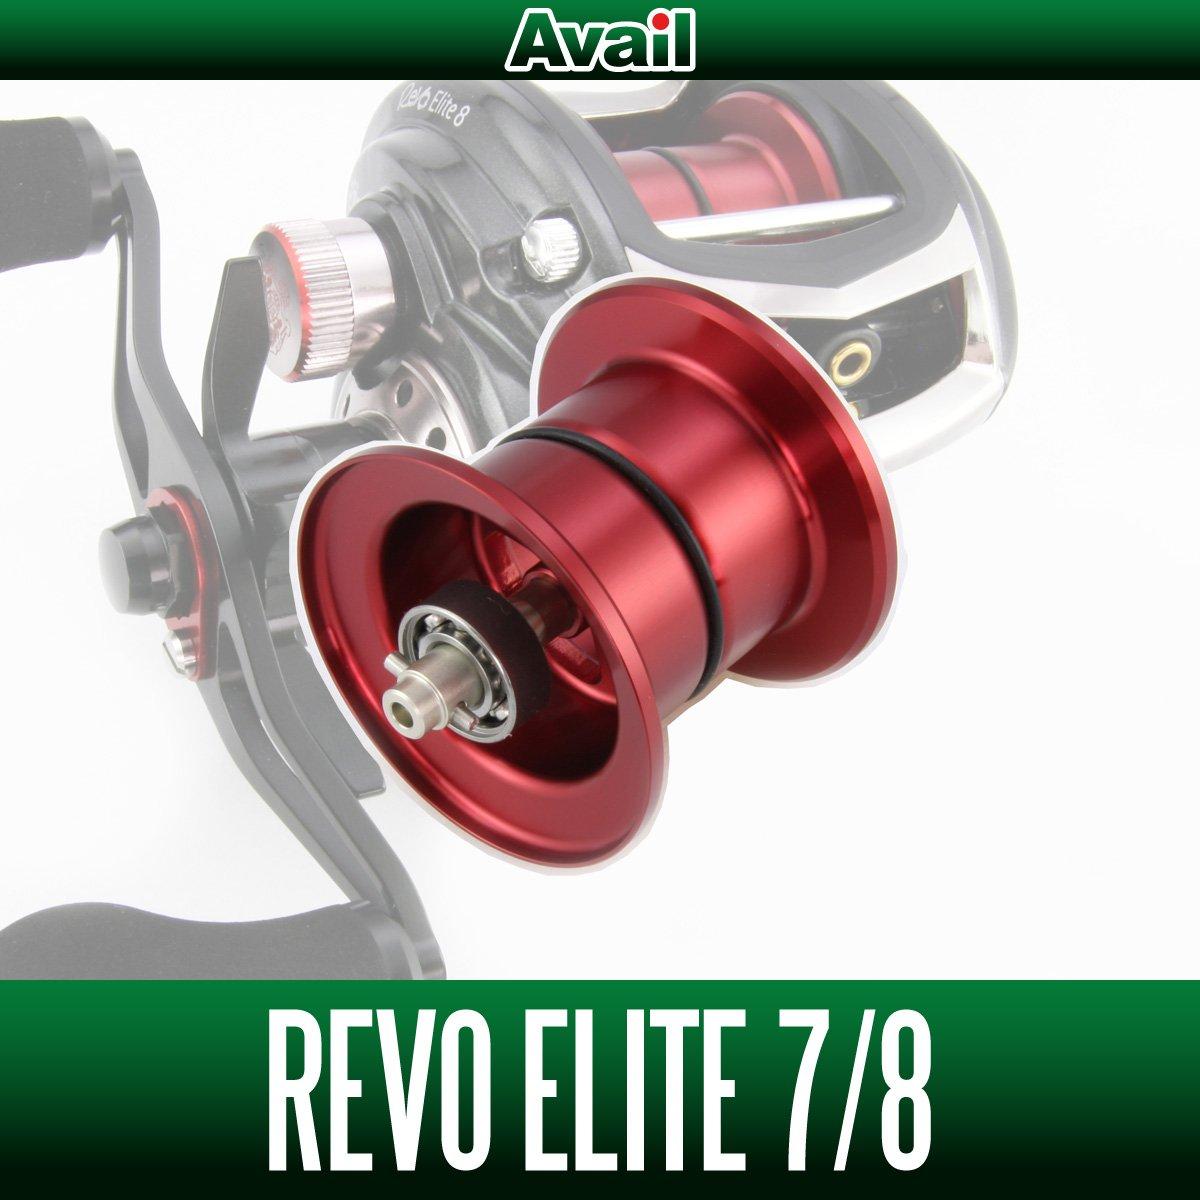 【Avail/アベイル】 Abu Revo3 エリート用 NEWマイクロキャストスプール RV352R-IV レッド   B00YAH5WYI